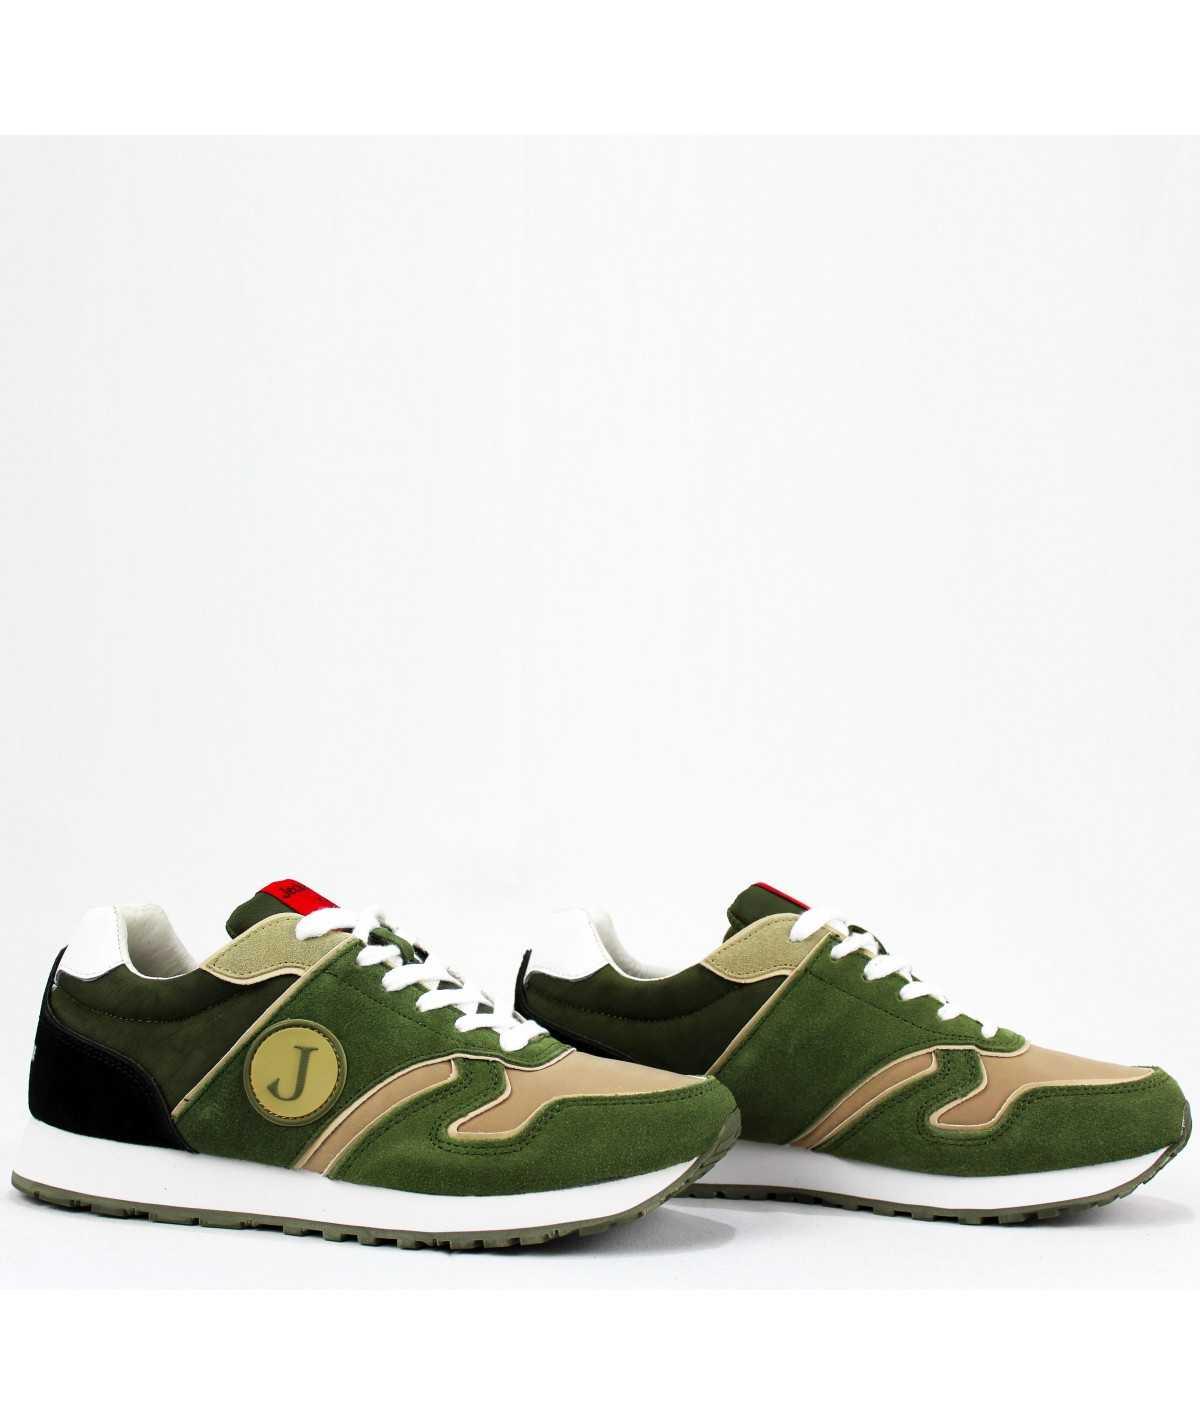 JECKERSON Sneakers